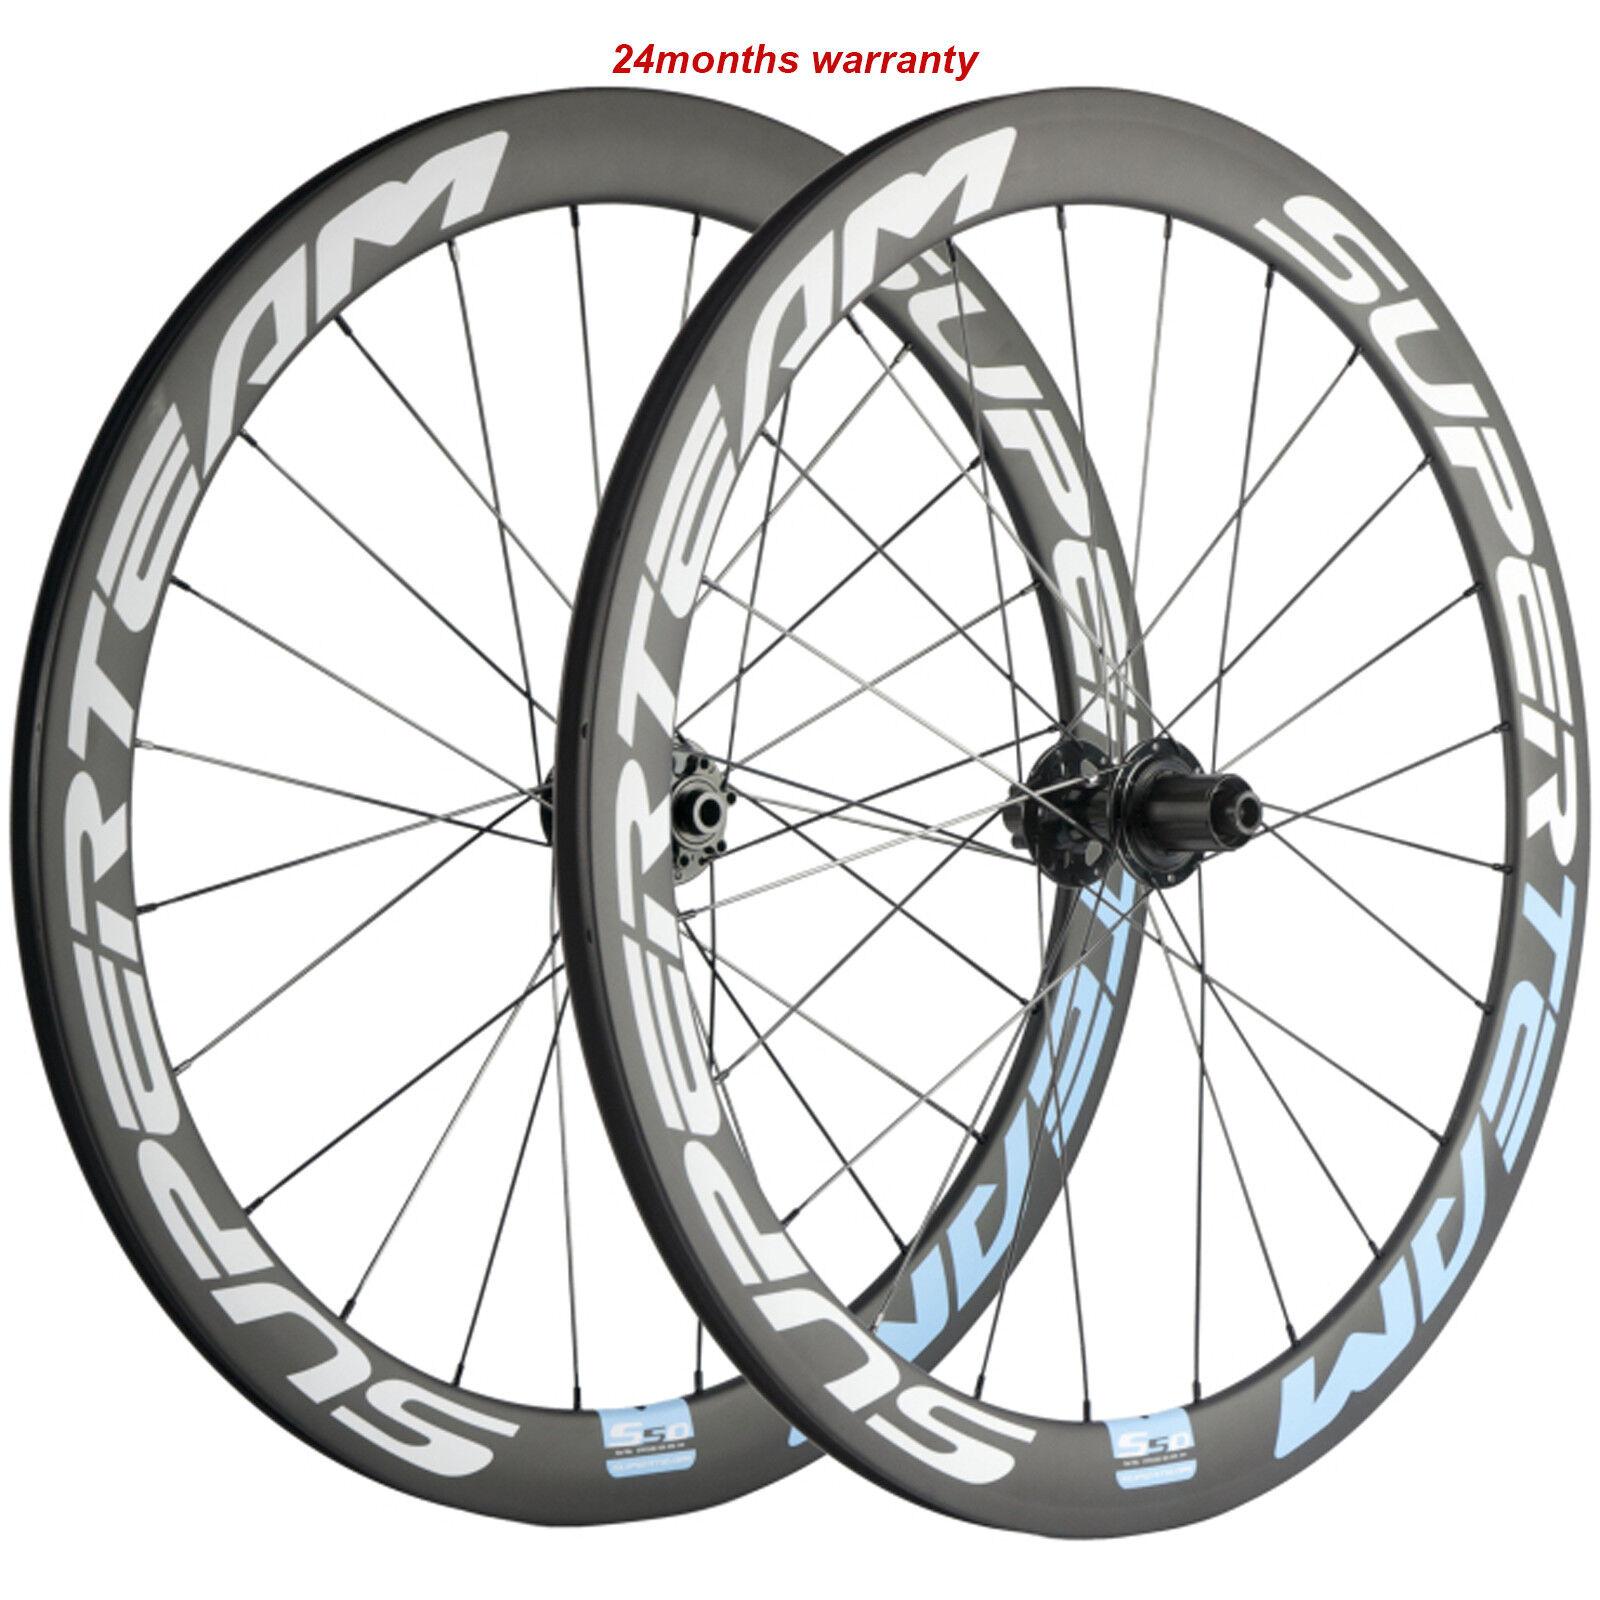 Disc Brake Carbon Wheelset 50mm Disc Brake Road Bike Wheelset 700C QR Thru Axle